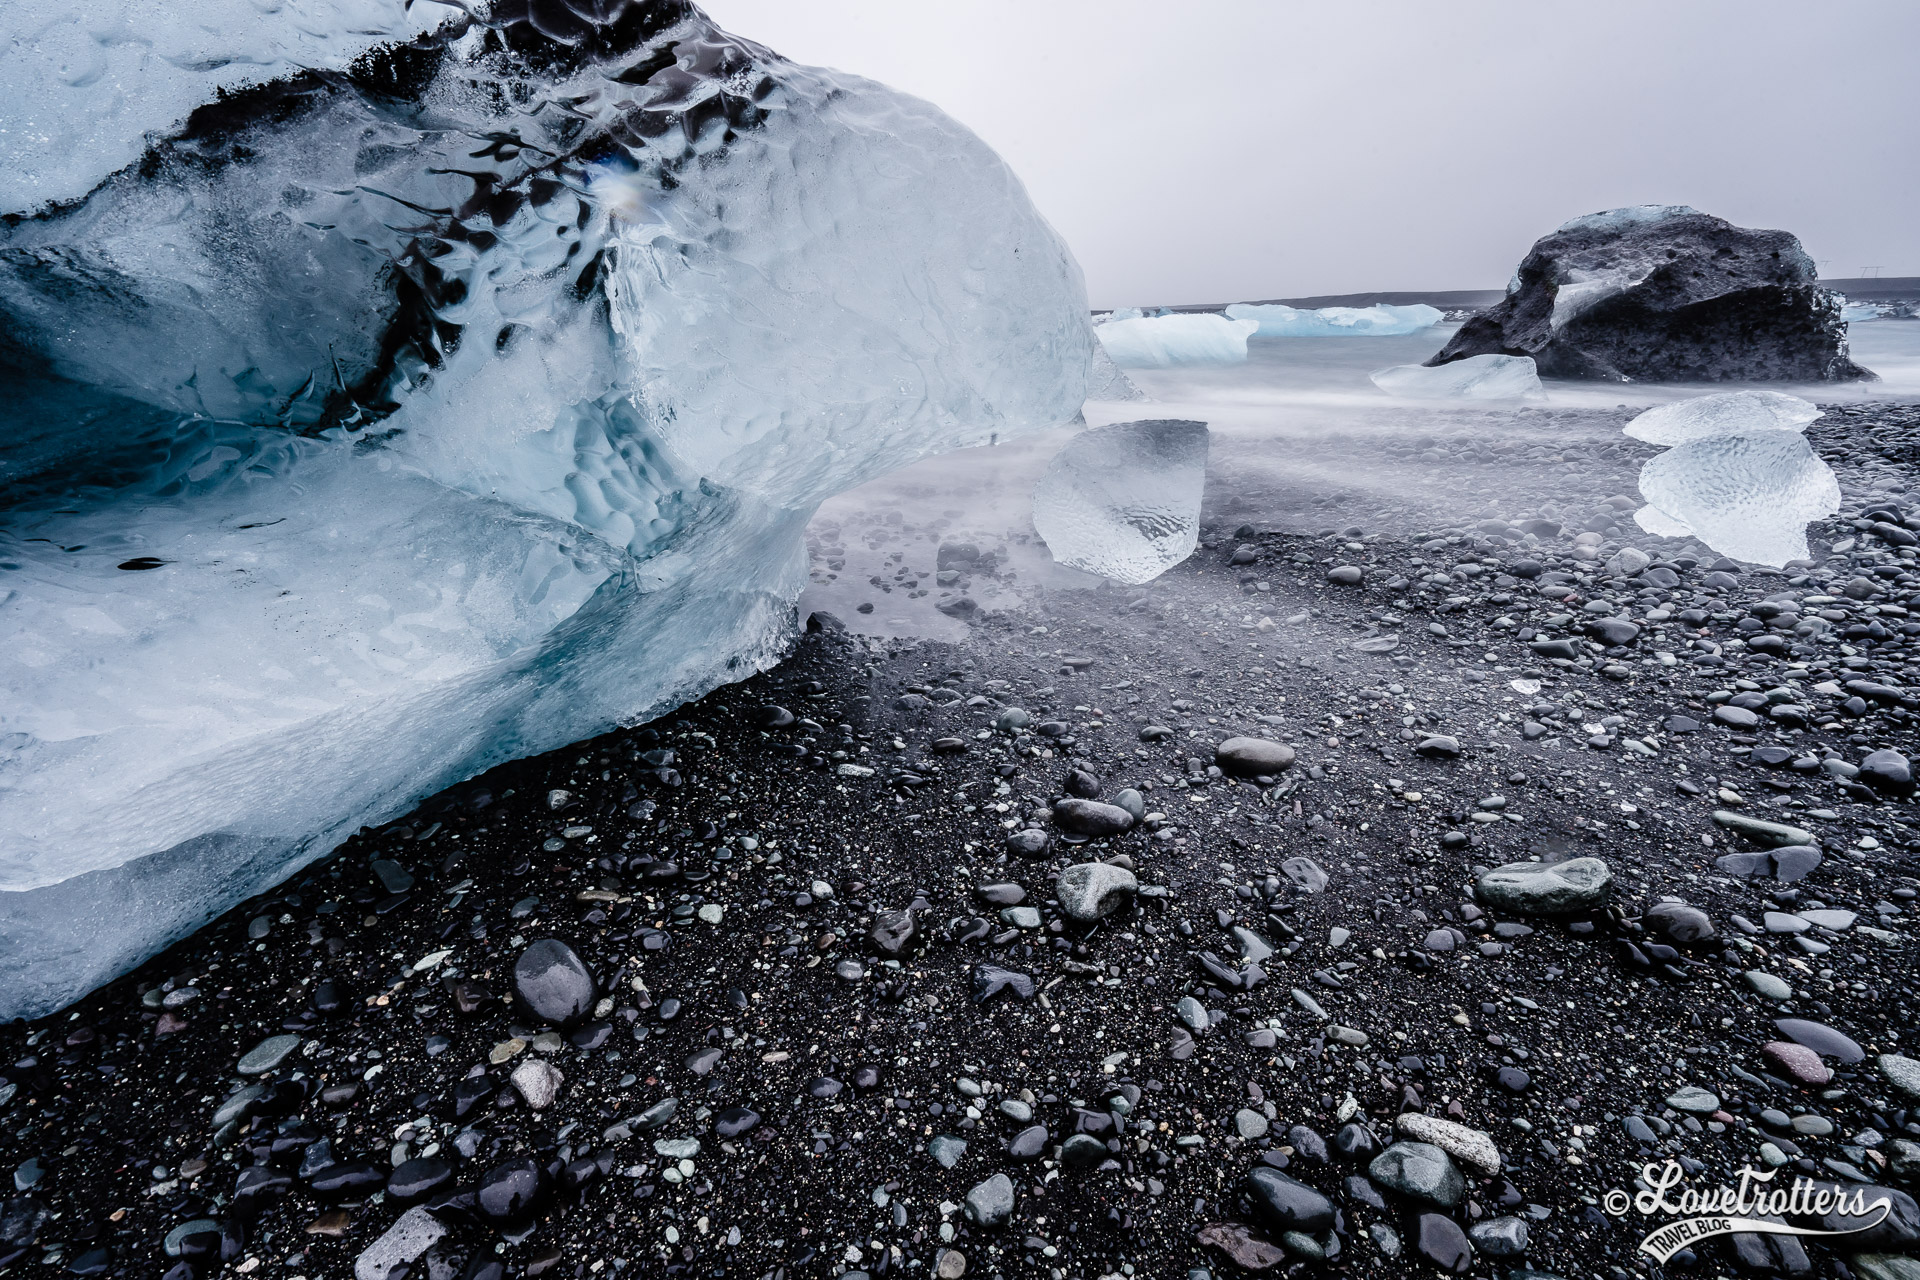 Les icebergs échoués sur la plage des diamants en Islande